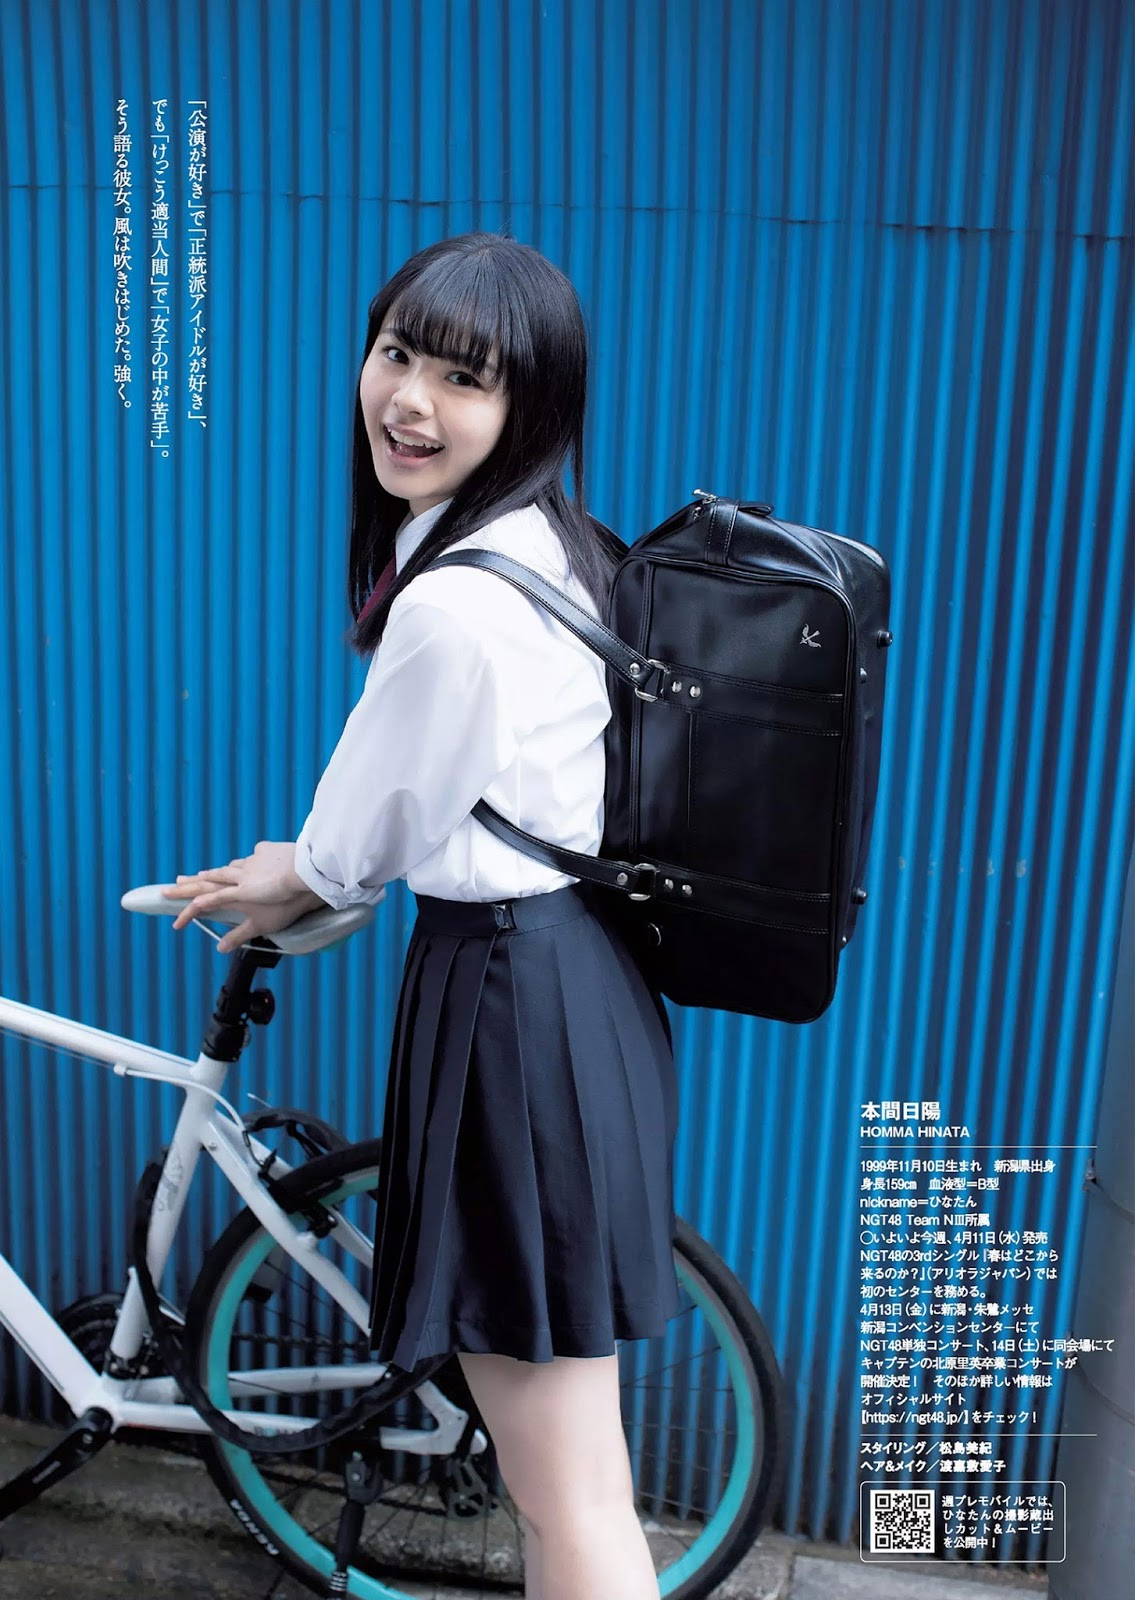 Homma Hinata 本間日陽, Weekly Playboy 2018 No.17 (週刊プレイボーイ 2018年17号)